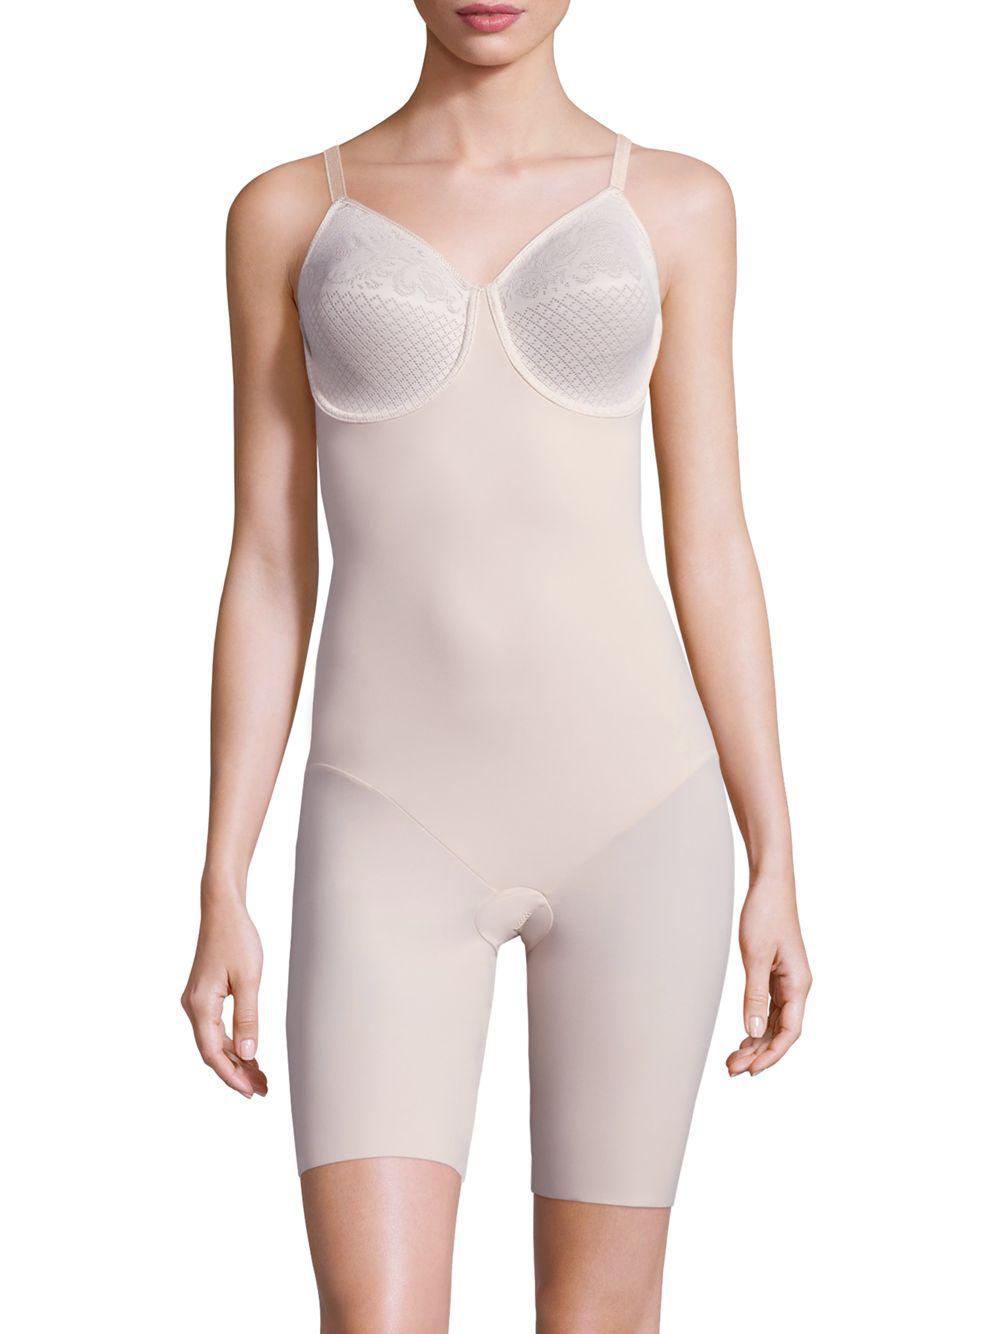 e5b3d7dafcf Wacoal. Women s Visual Effects Thigh Shaper Bodysuit